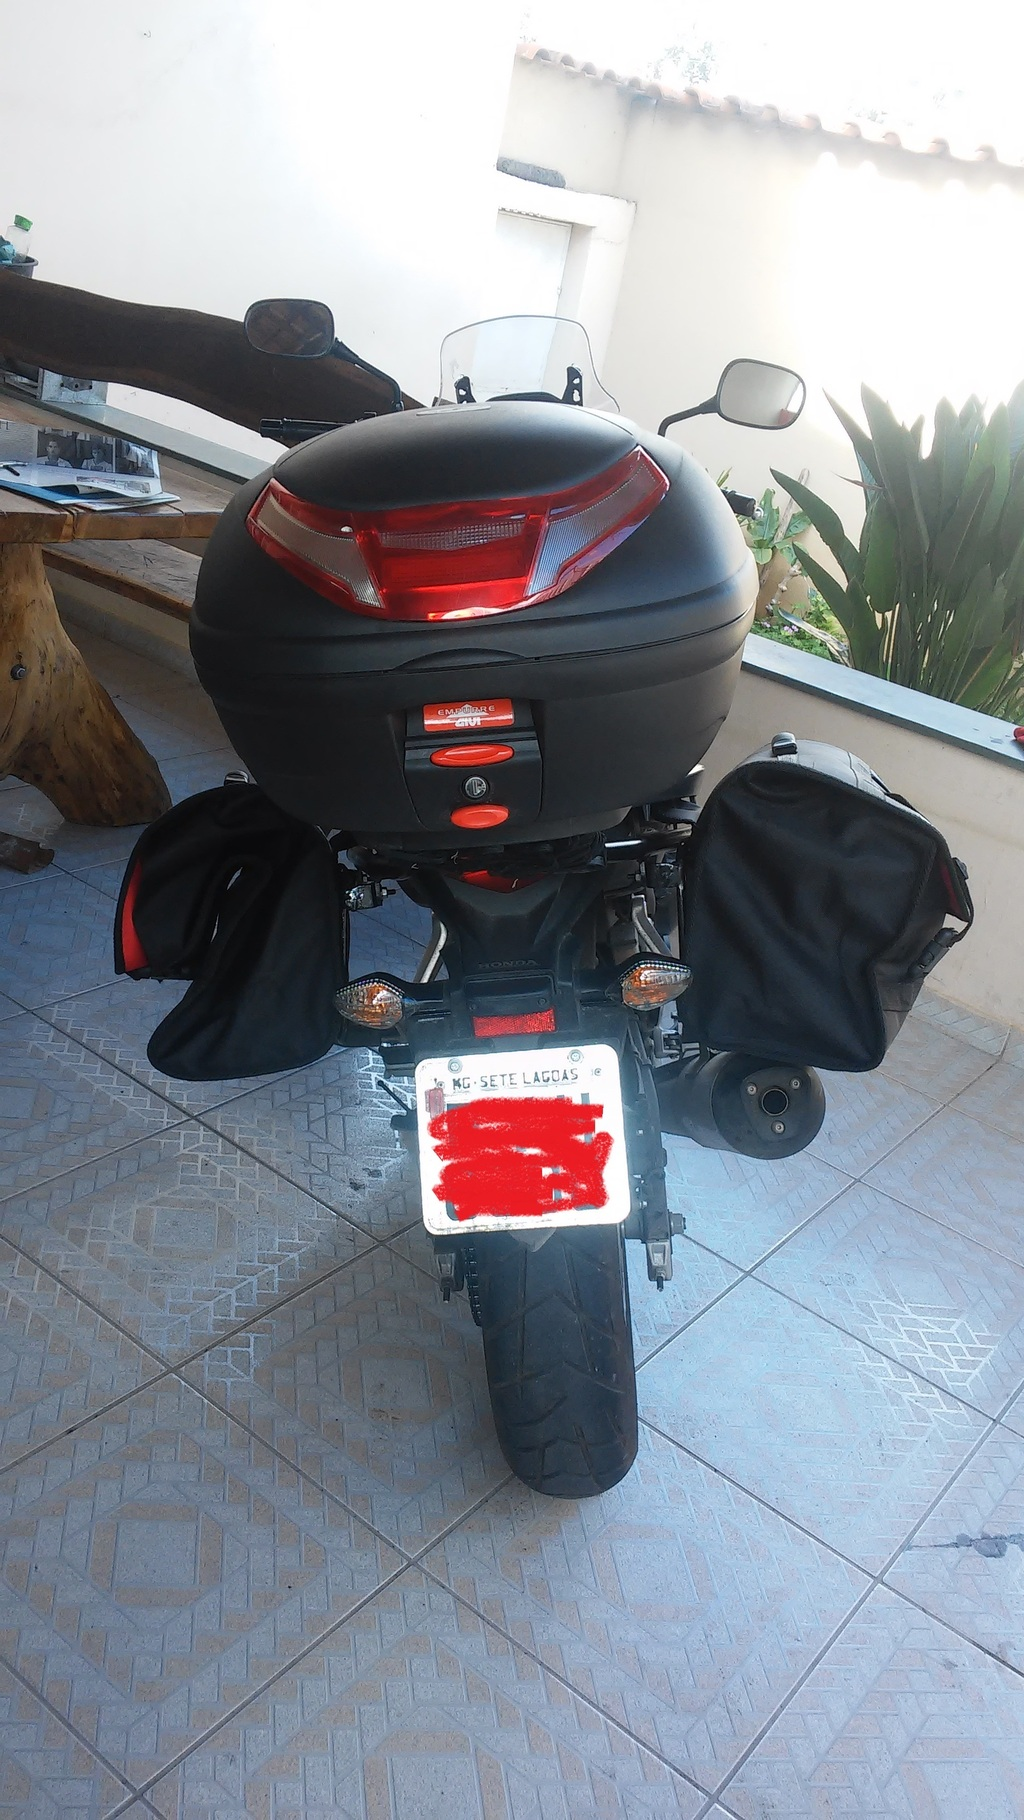 Kit Alforge Lateral + Afastador Honda Cb500 X(Barato) - Página 2 20150619_134932